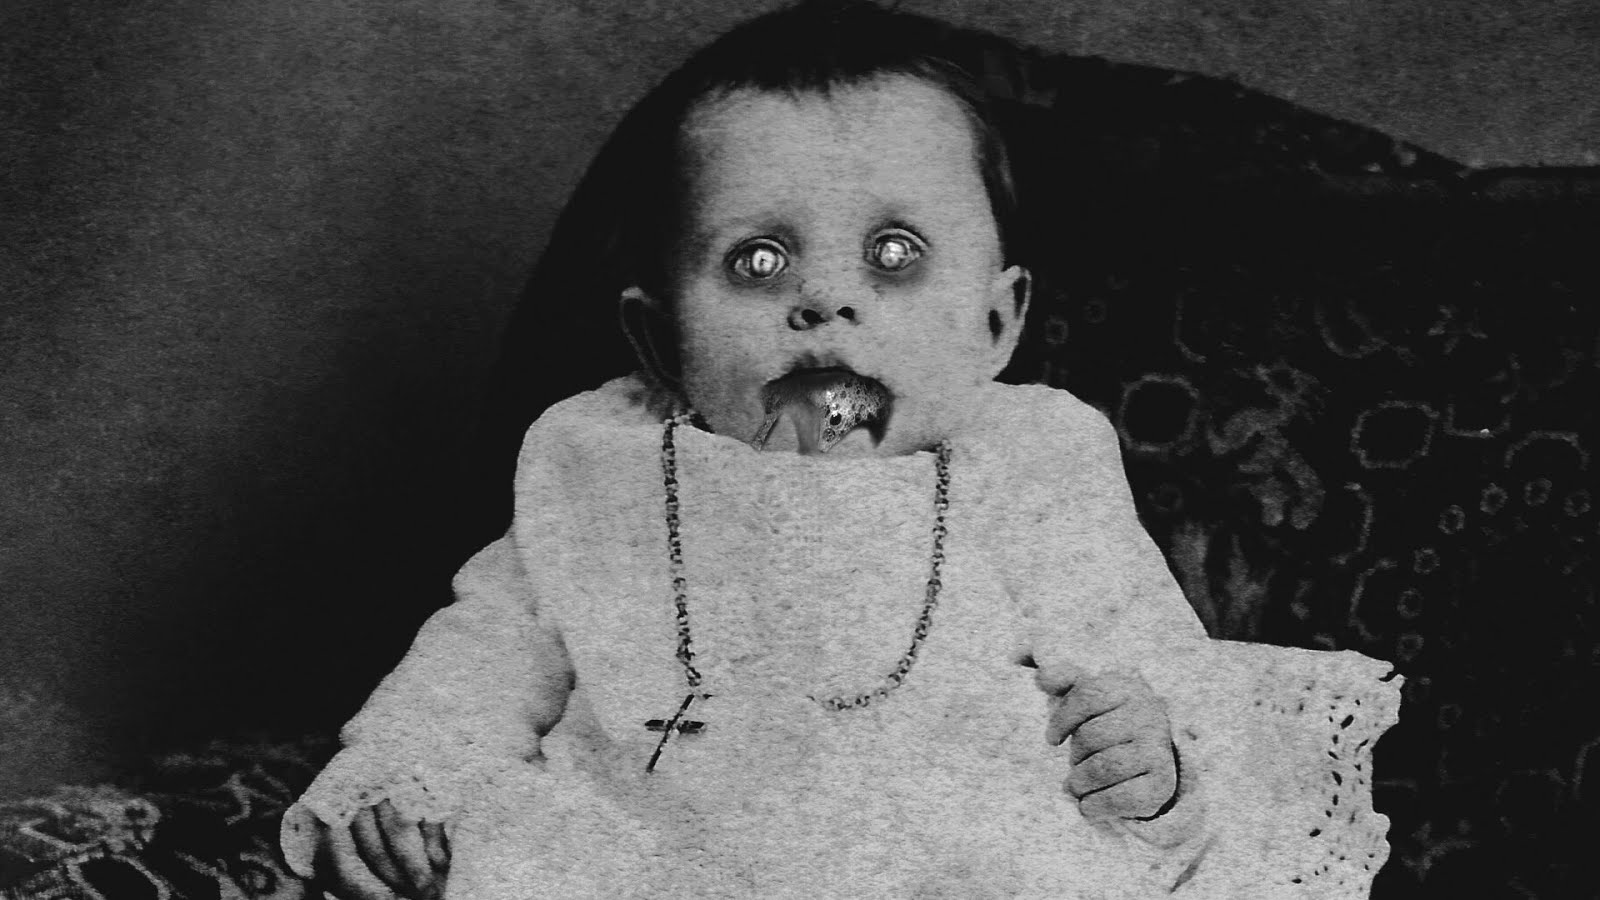 Sebaiknya Kamu Lari Ketika Bertemu Bayi Setan Berikut Ini Selain